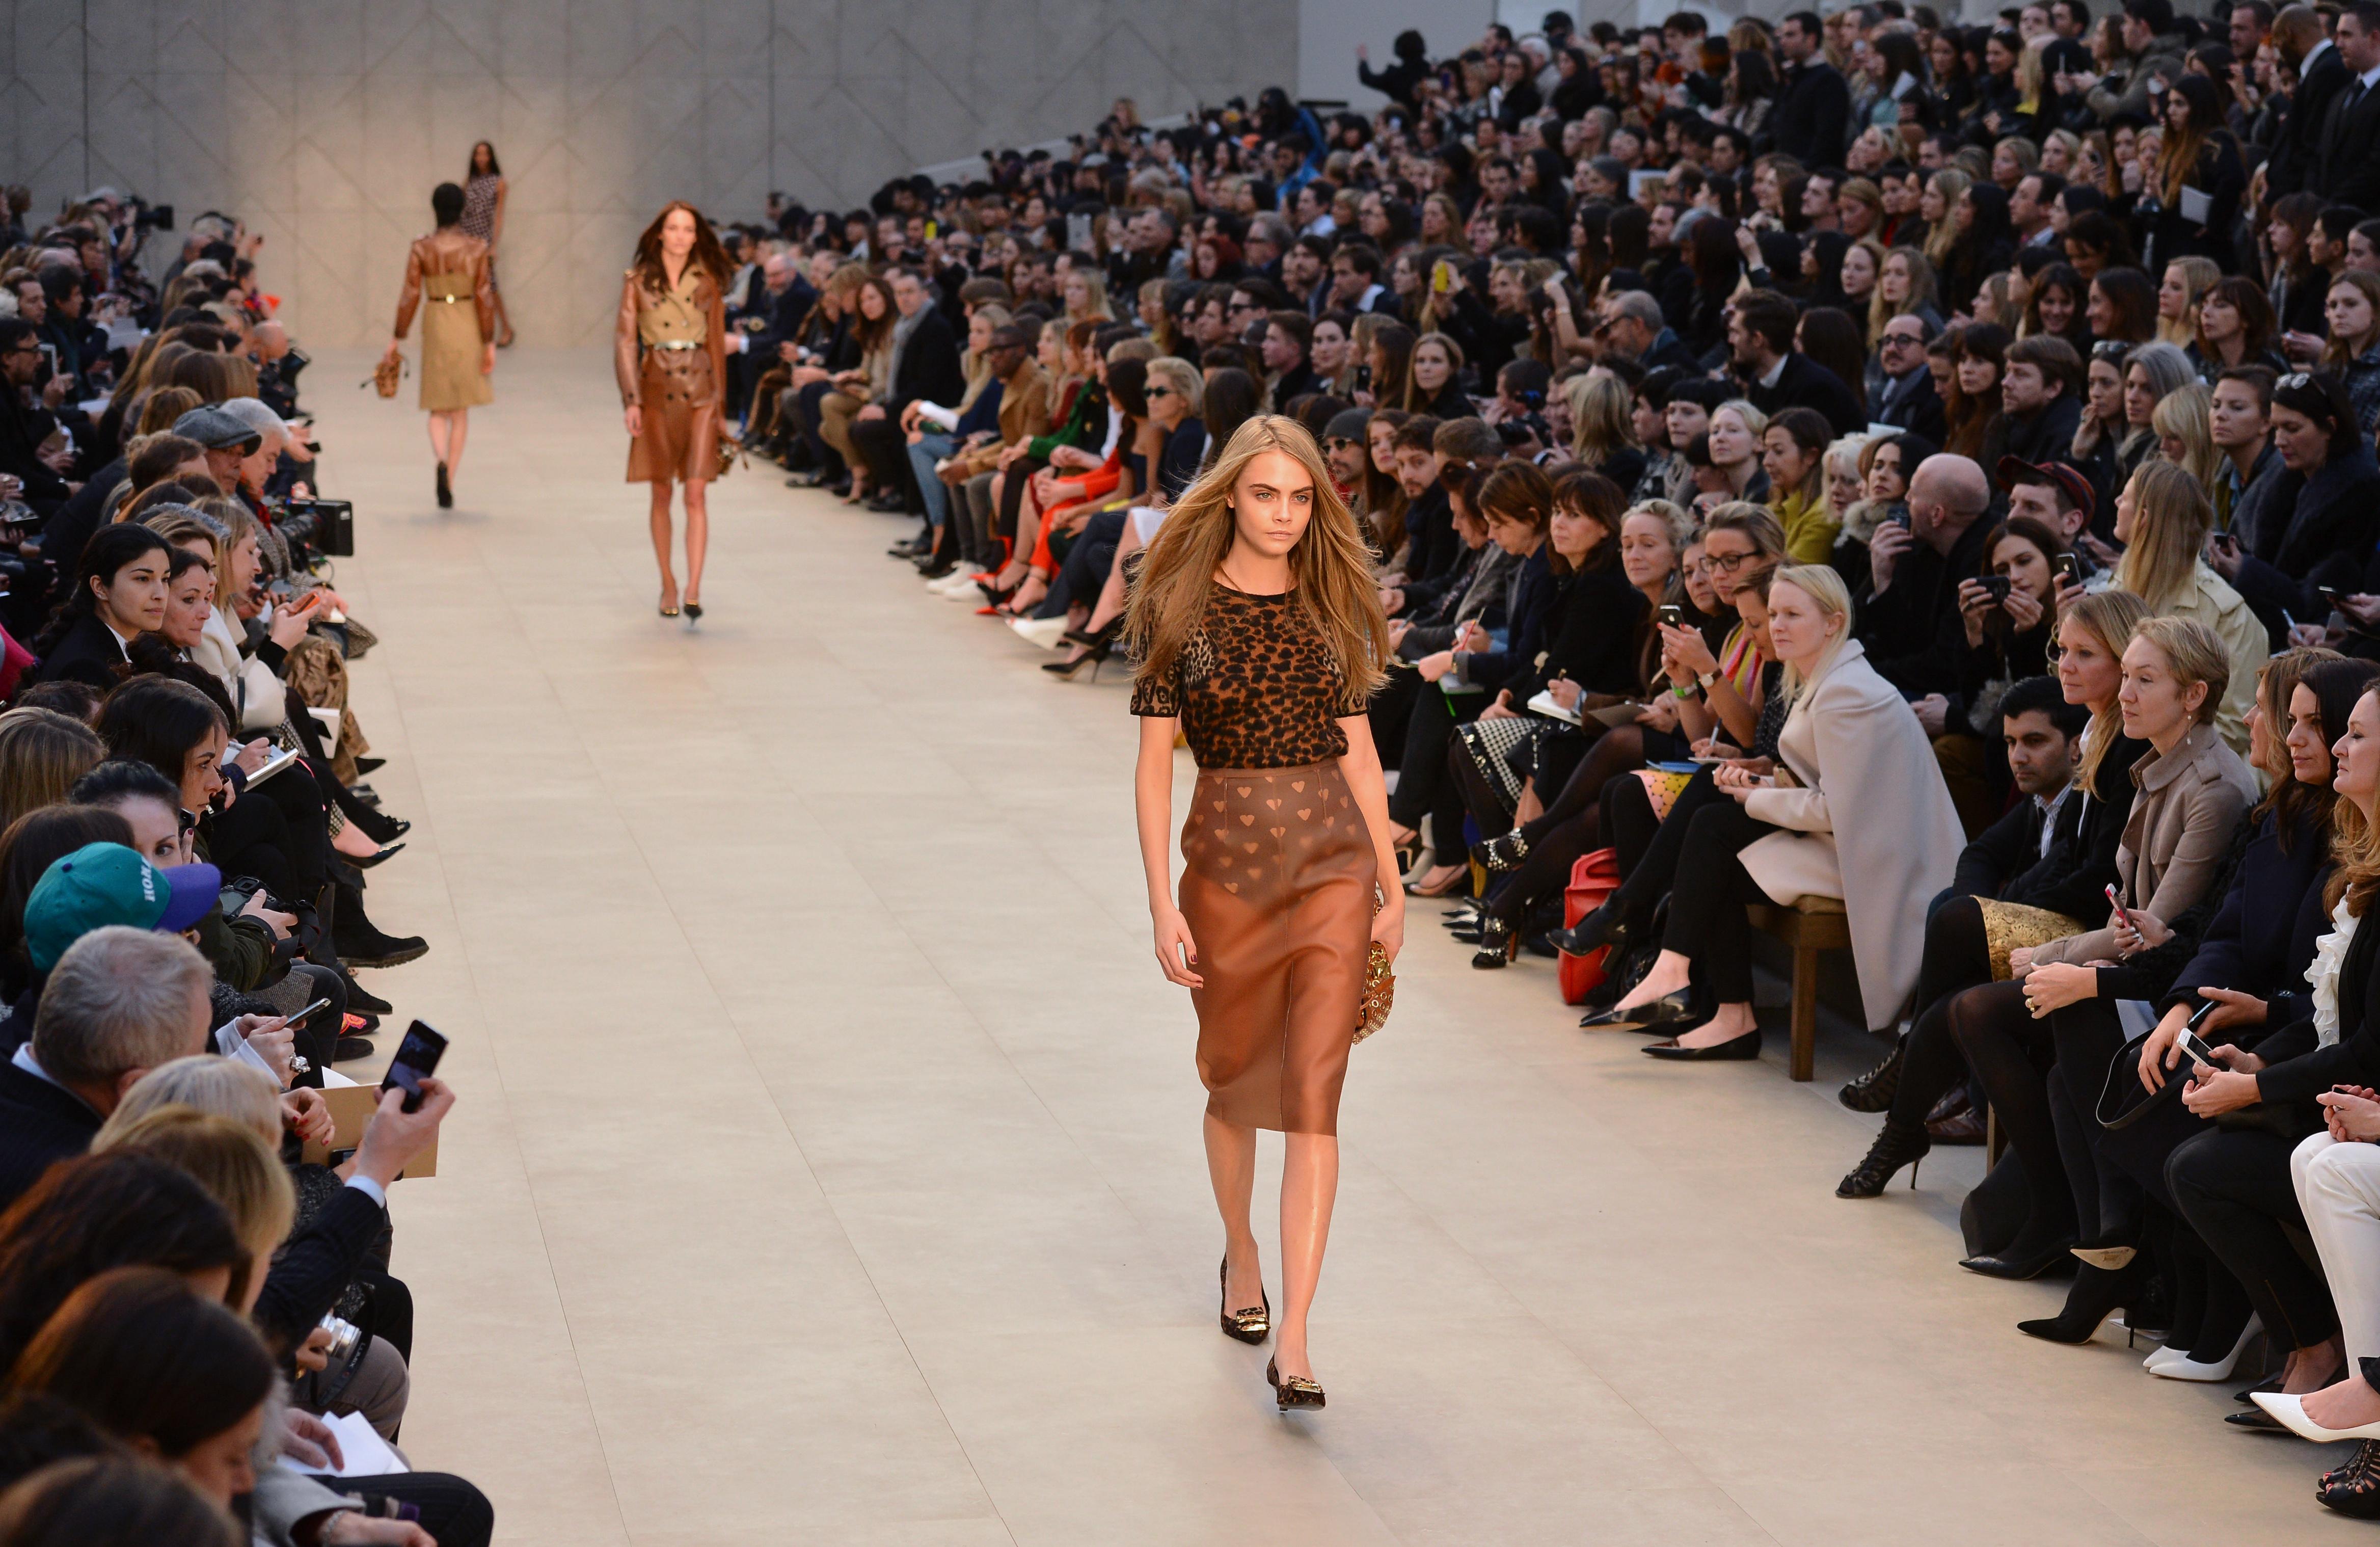 Burberry Prorsum's AW13 London Fashion Week show